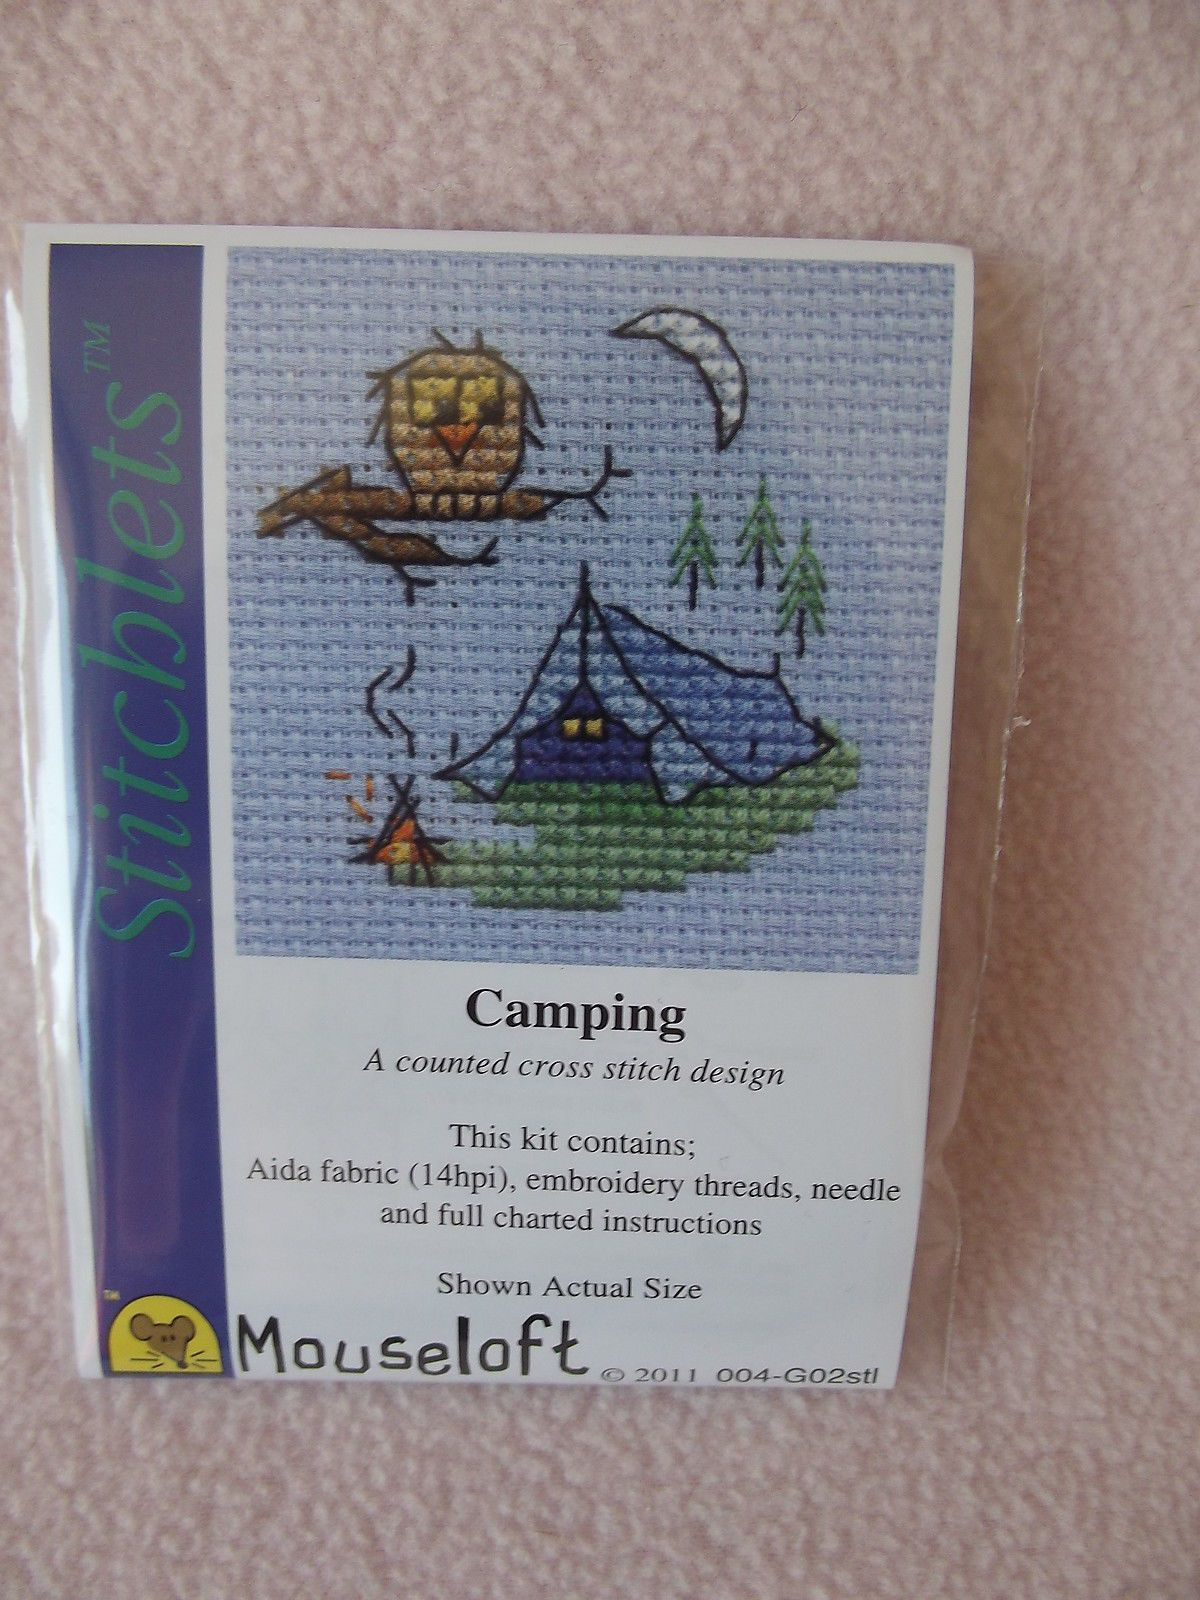 MOUSELOFT STITCHLETS CROSS STITCH KIT ~ CAMPING ~ NEW